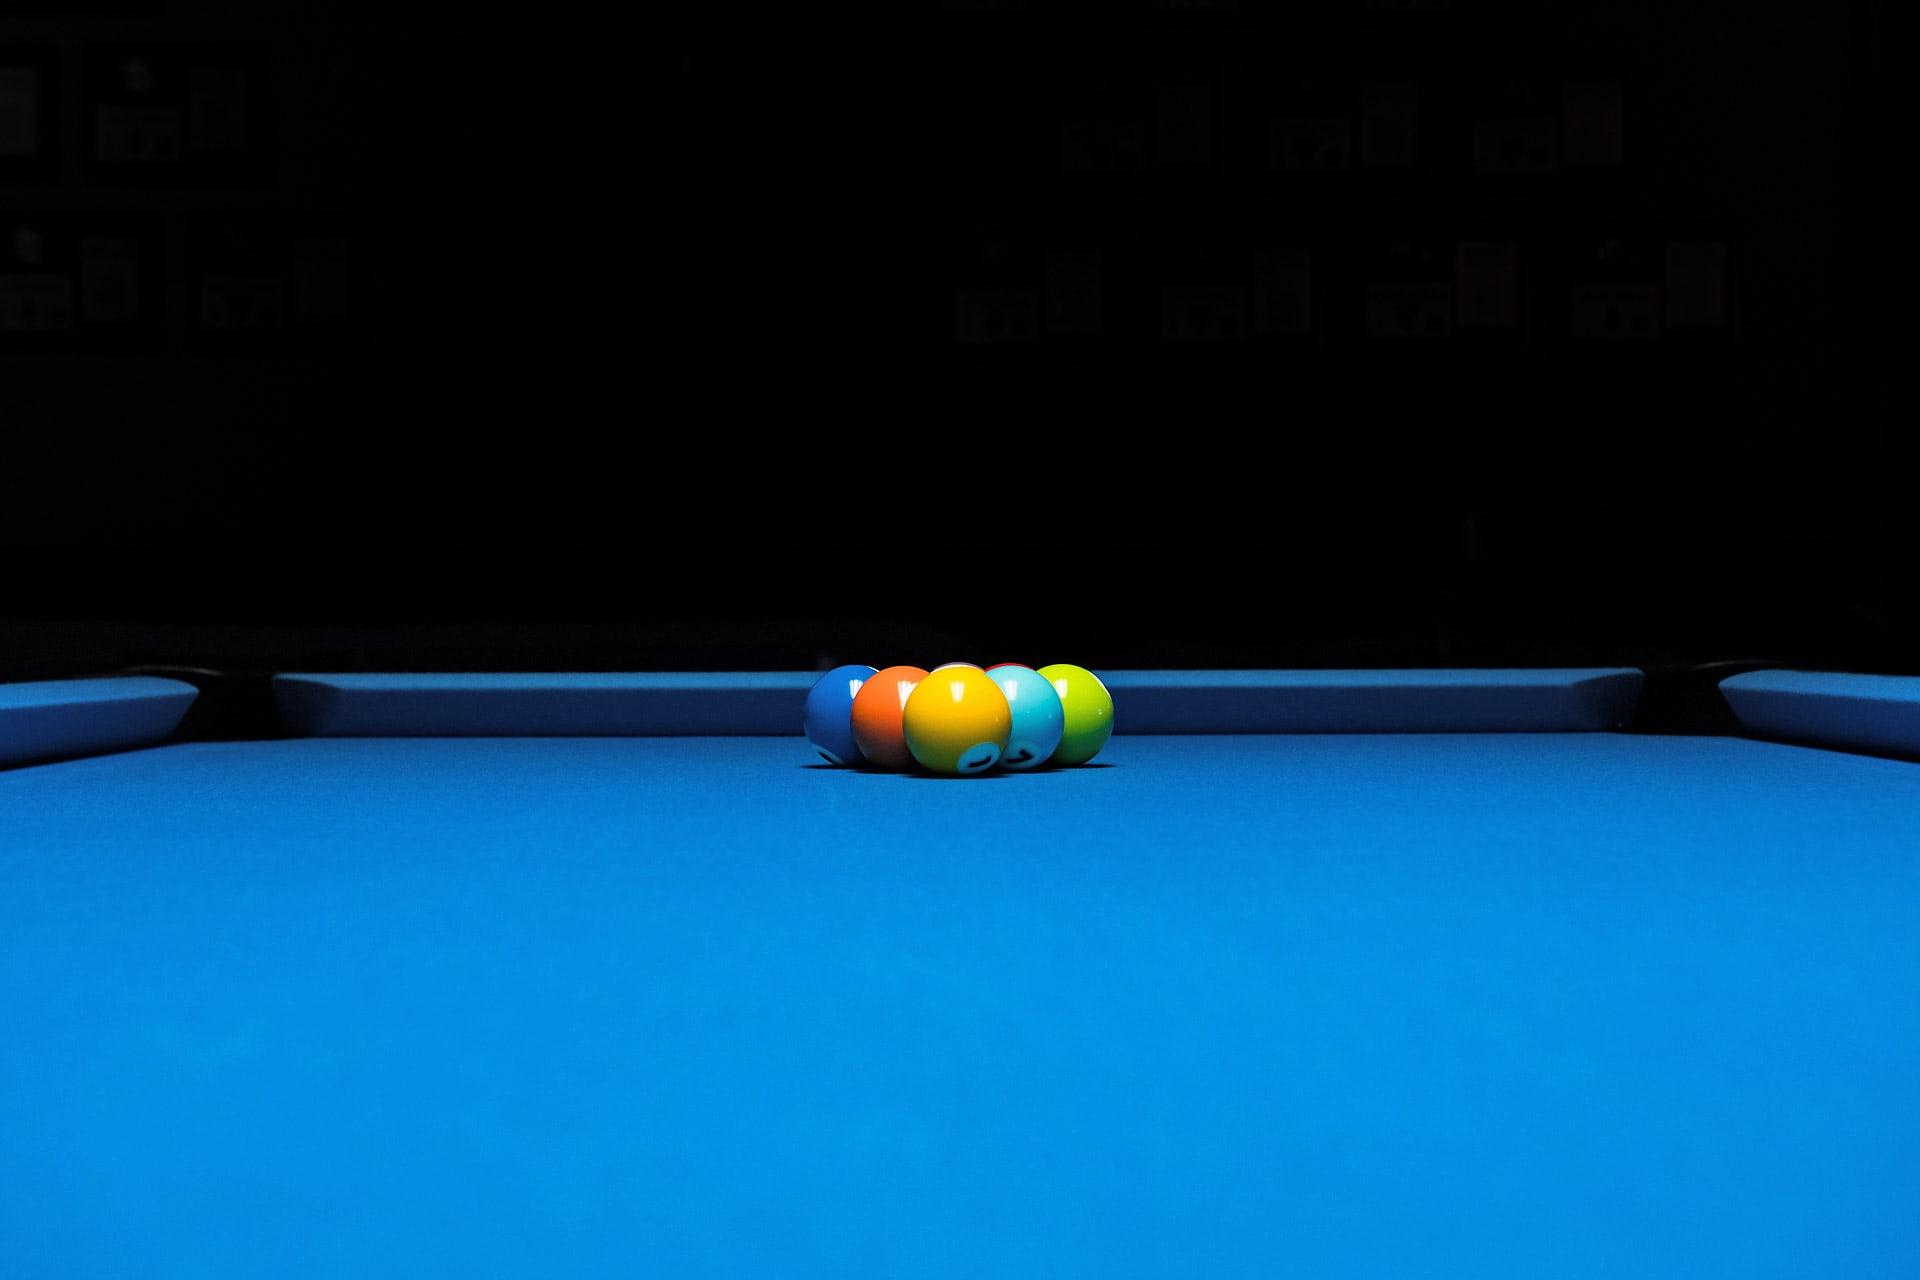 Diamond Pool Tables - Poppa G's Billiards - Birmingham, Pelham AL